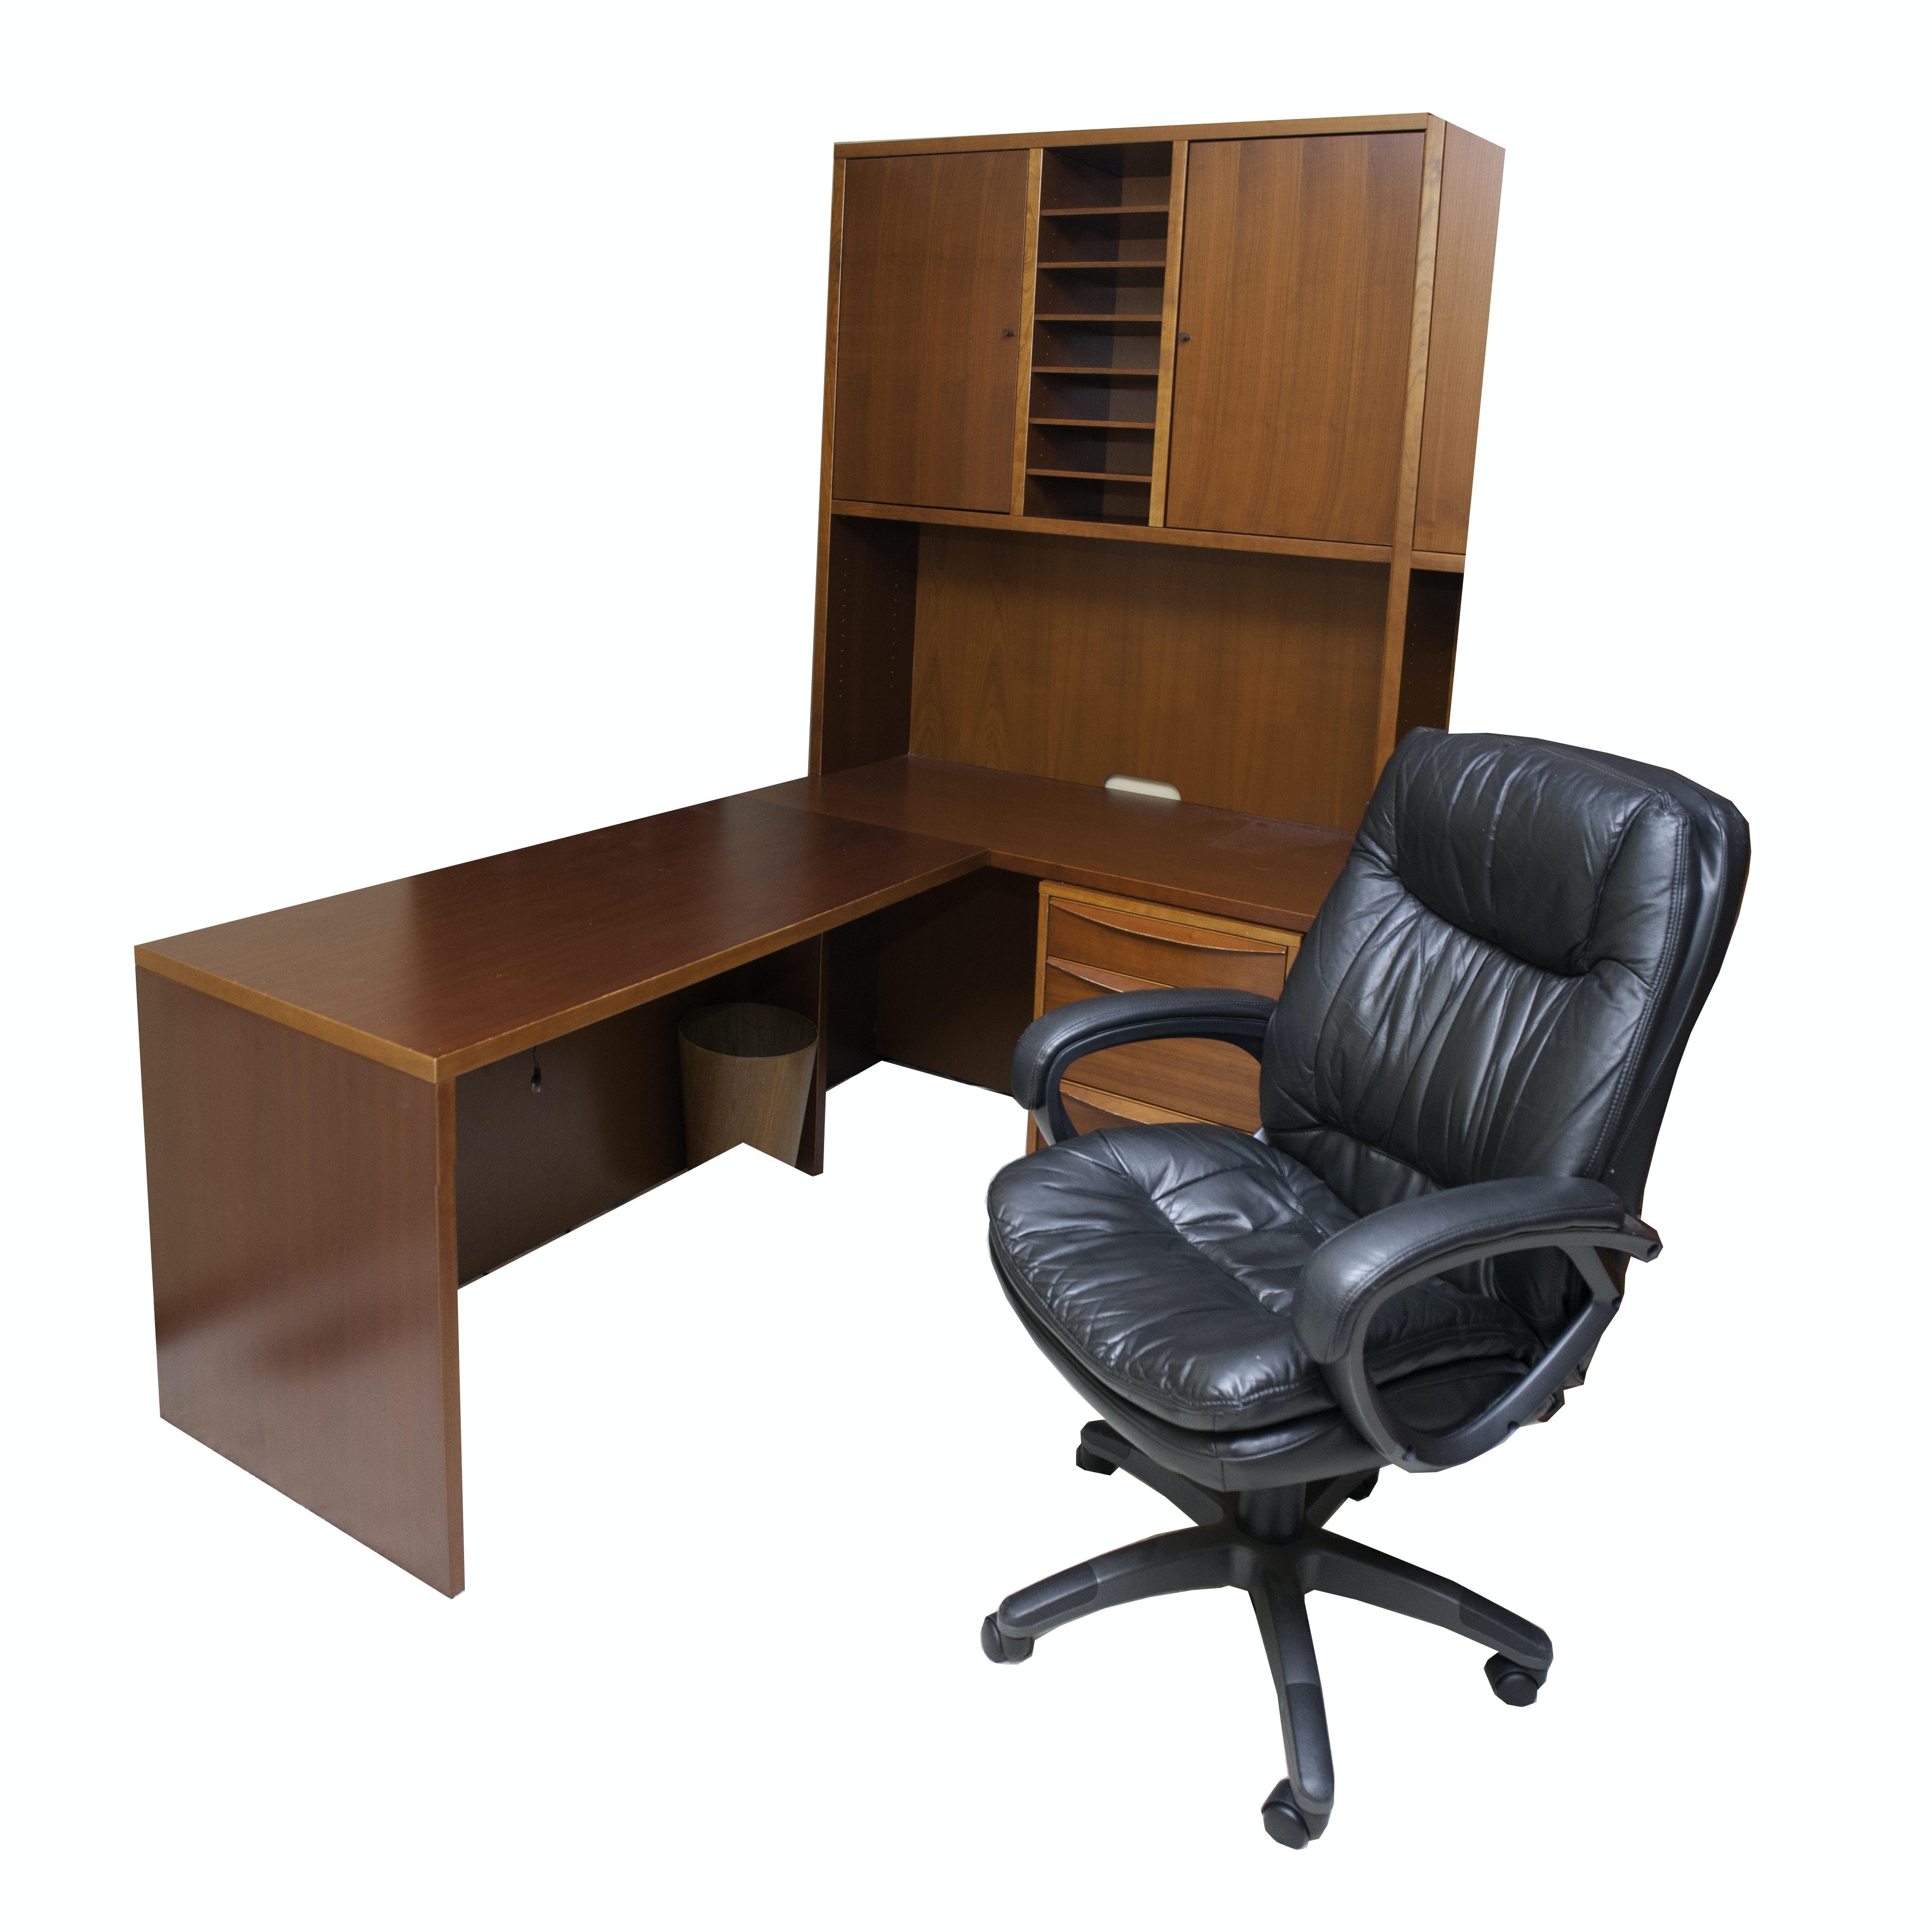 Jesper Modular Cherry Wooden Cubicle Desk and Chair